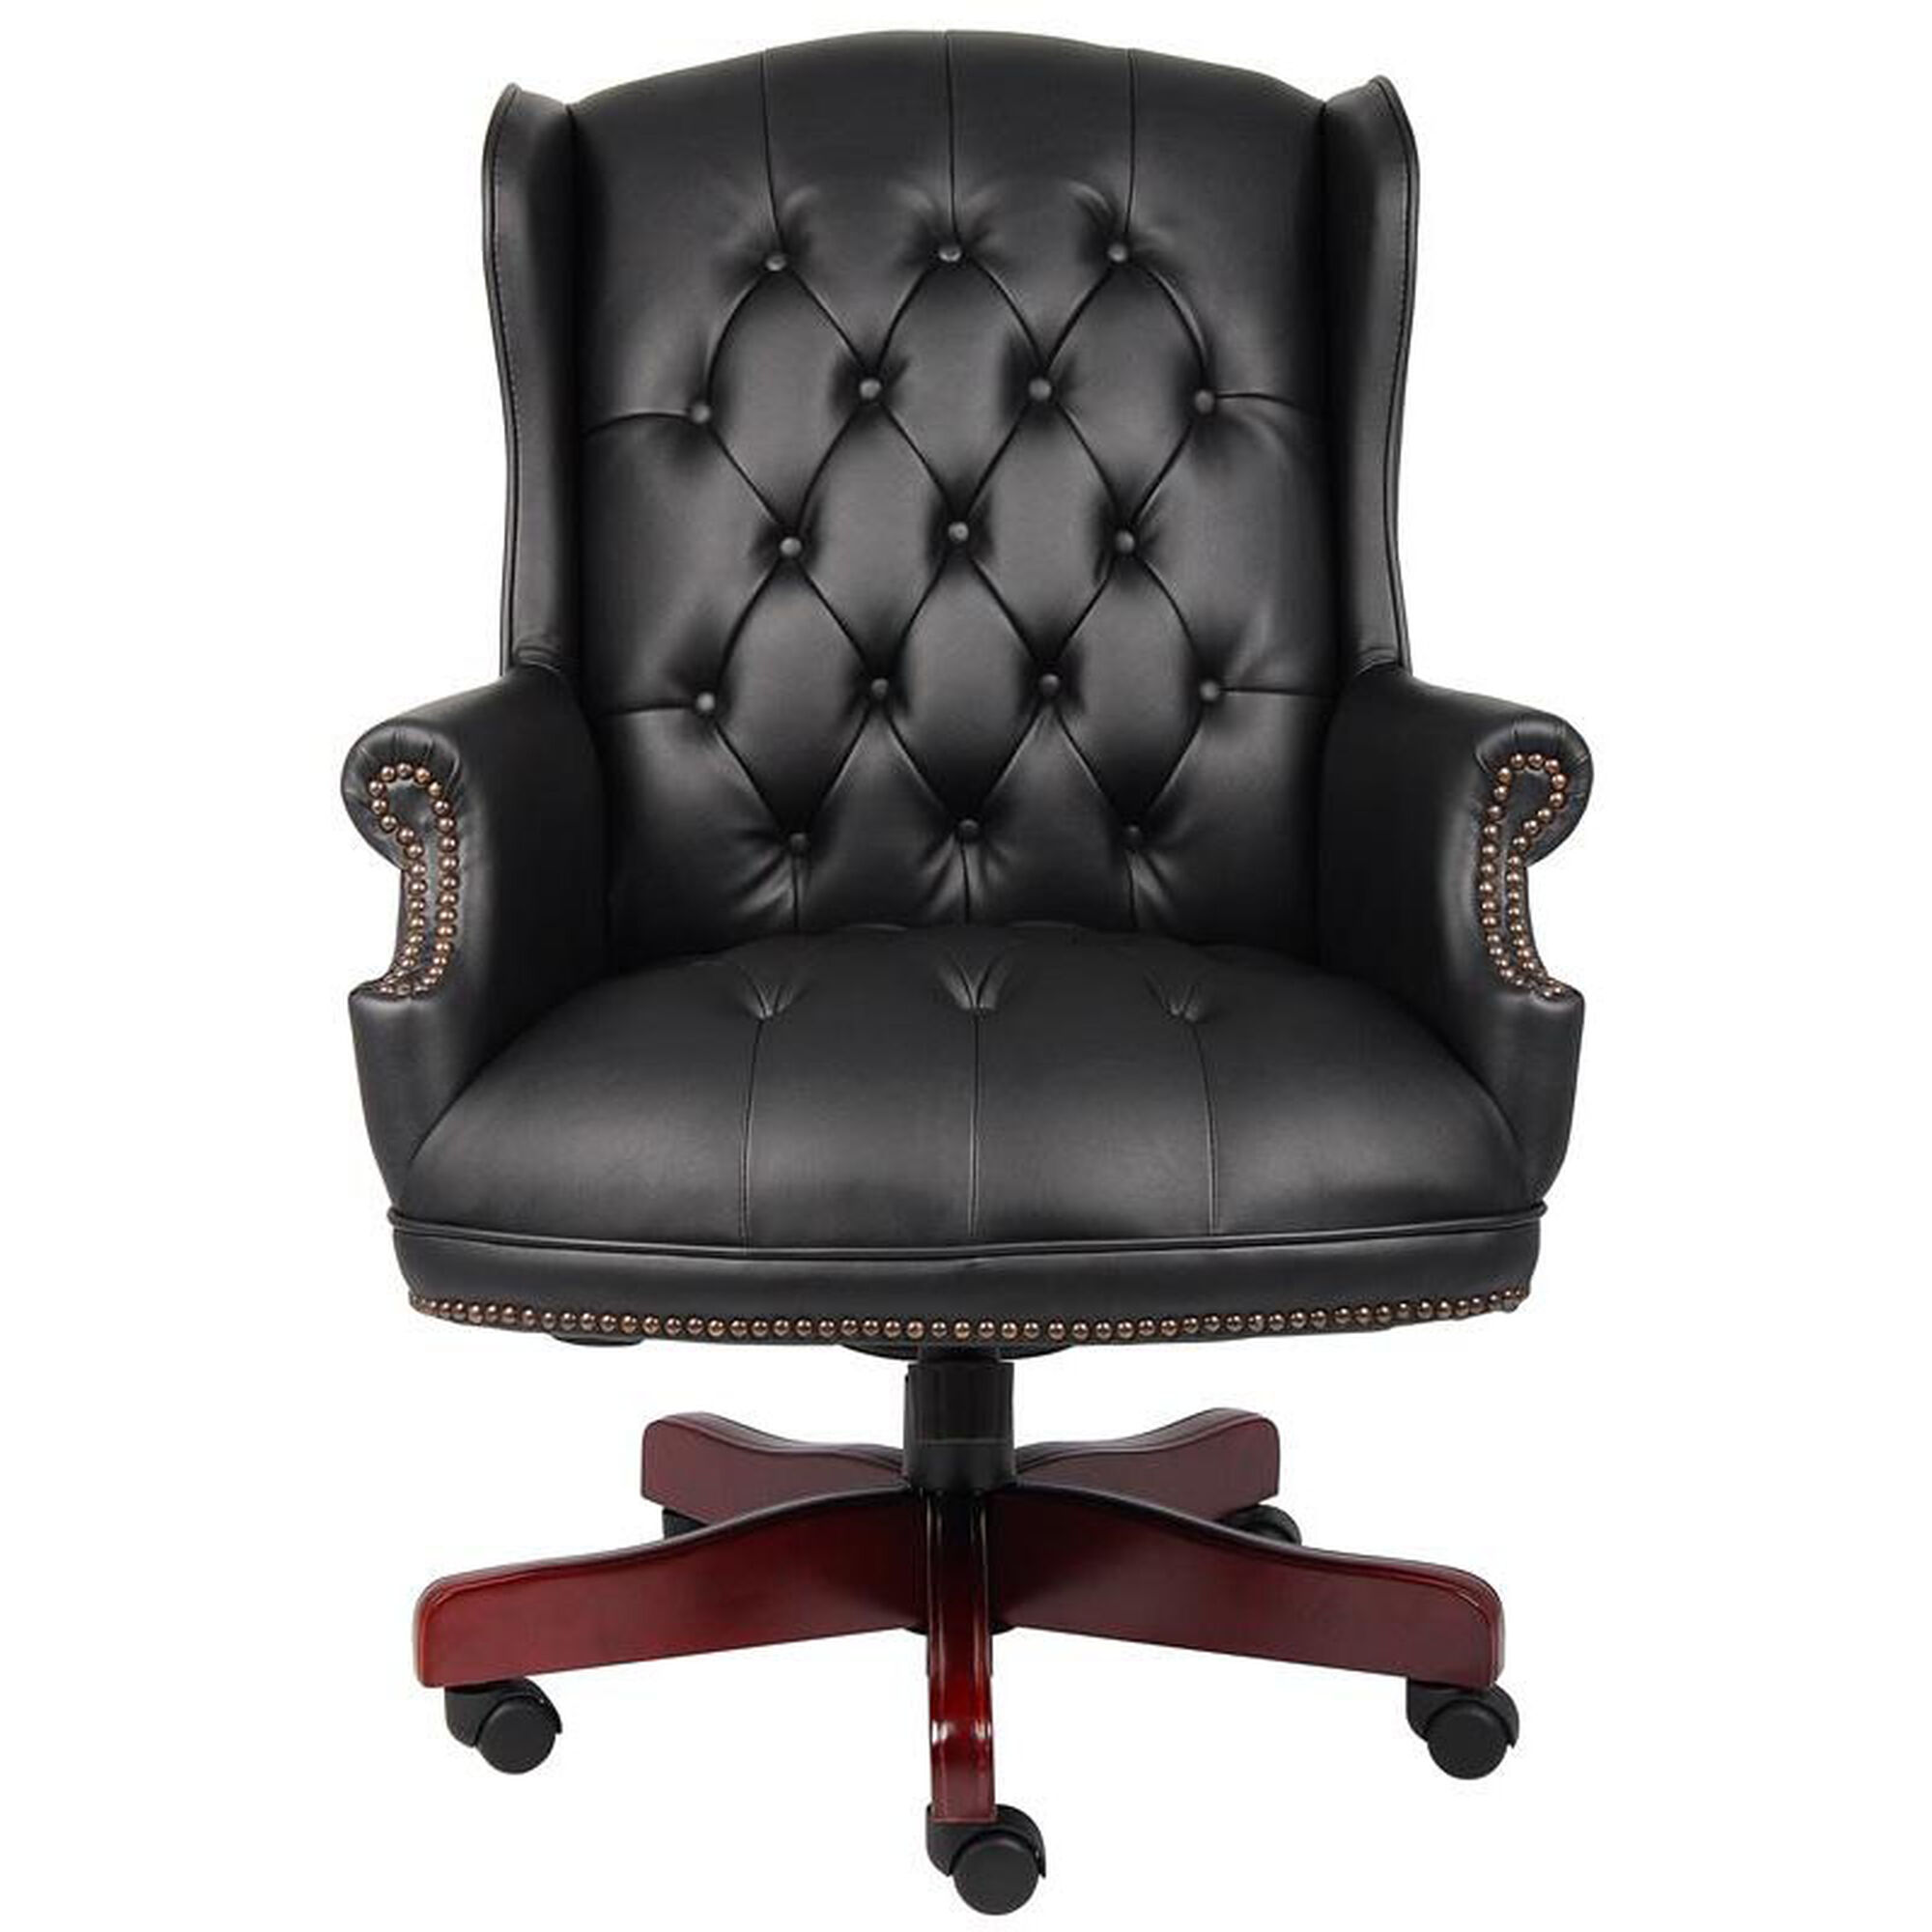 Button Tufted Wing Back Chair B800 Bk Restaurantfurniture4less Com